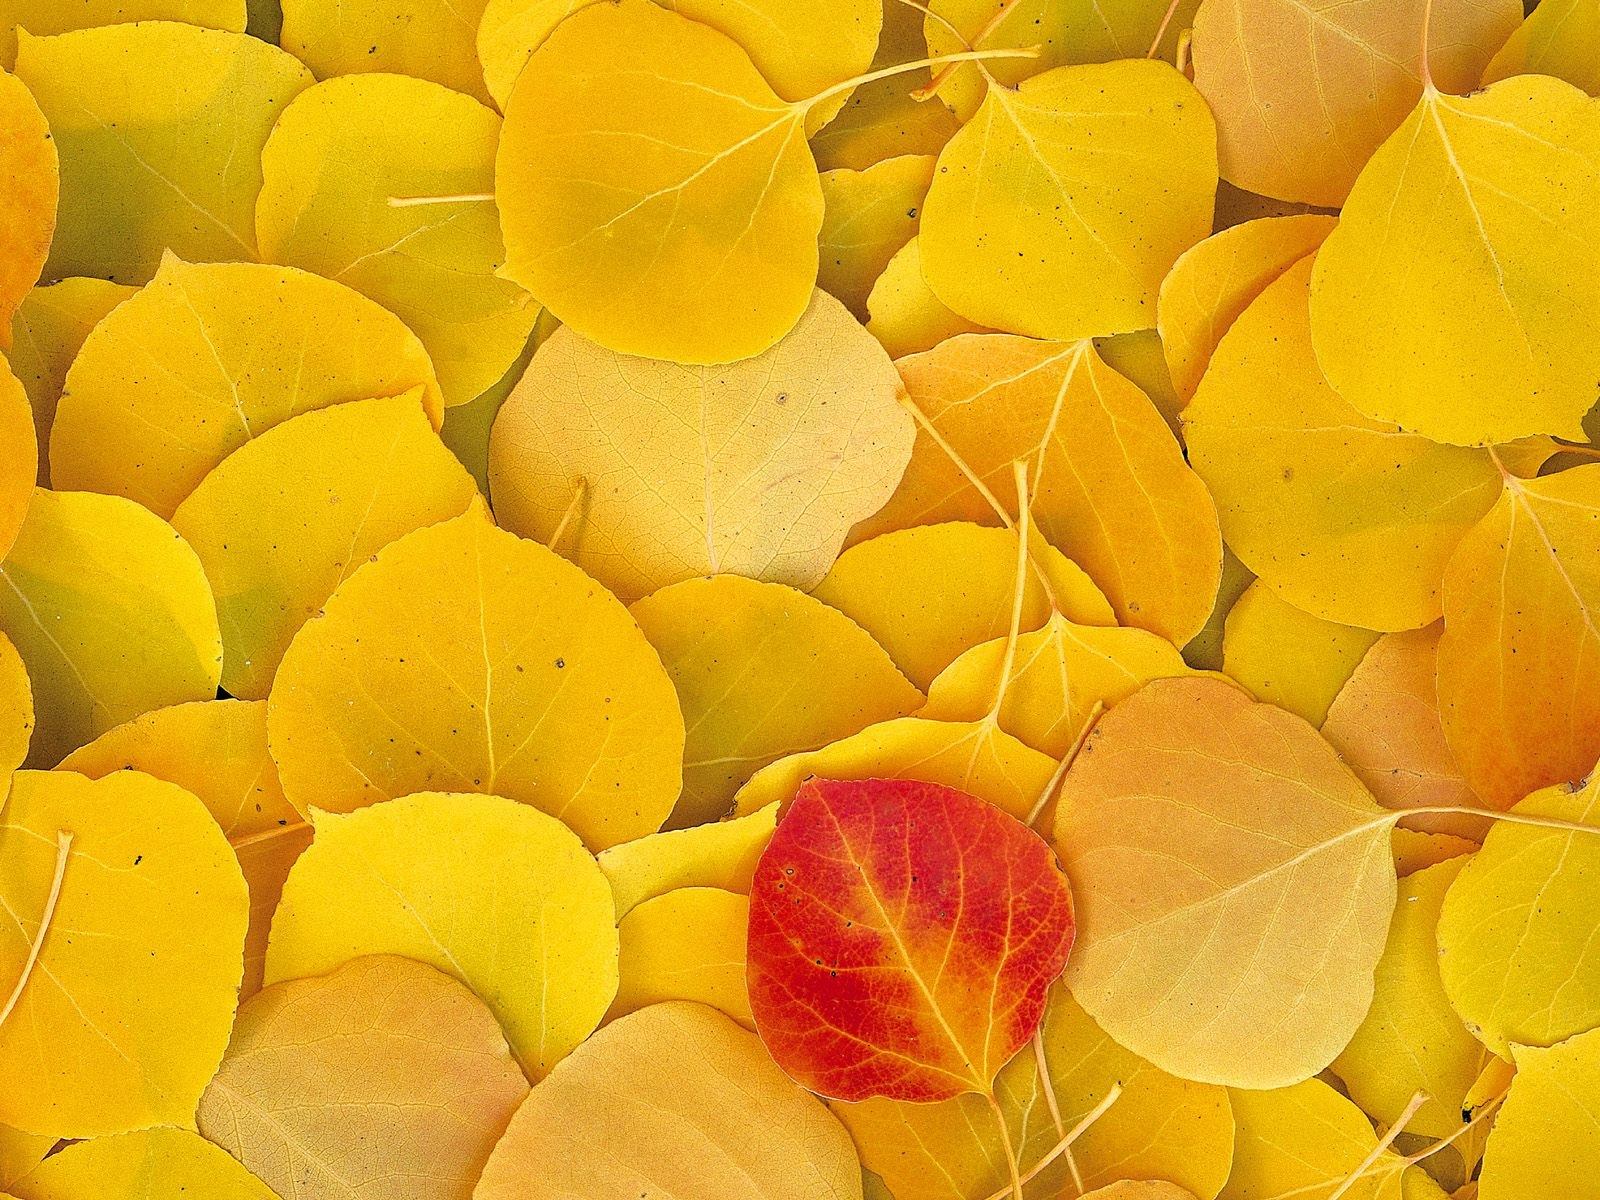 The best top autumn desktop wallpapers 36 En Güzel Sonbahar HD Duvar Kağıtları